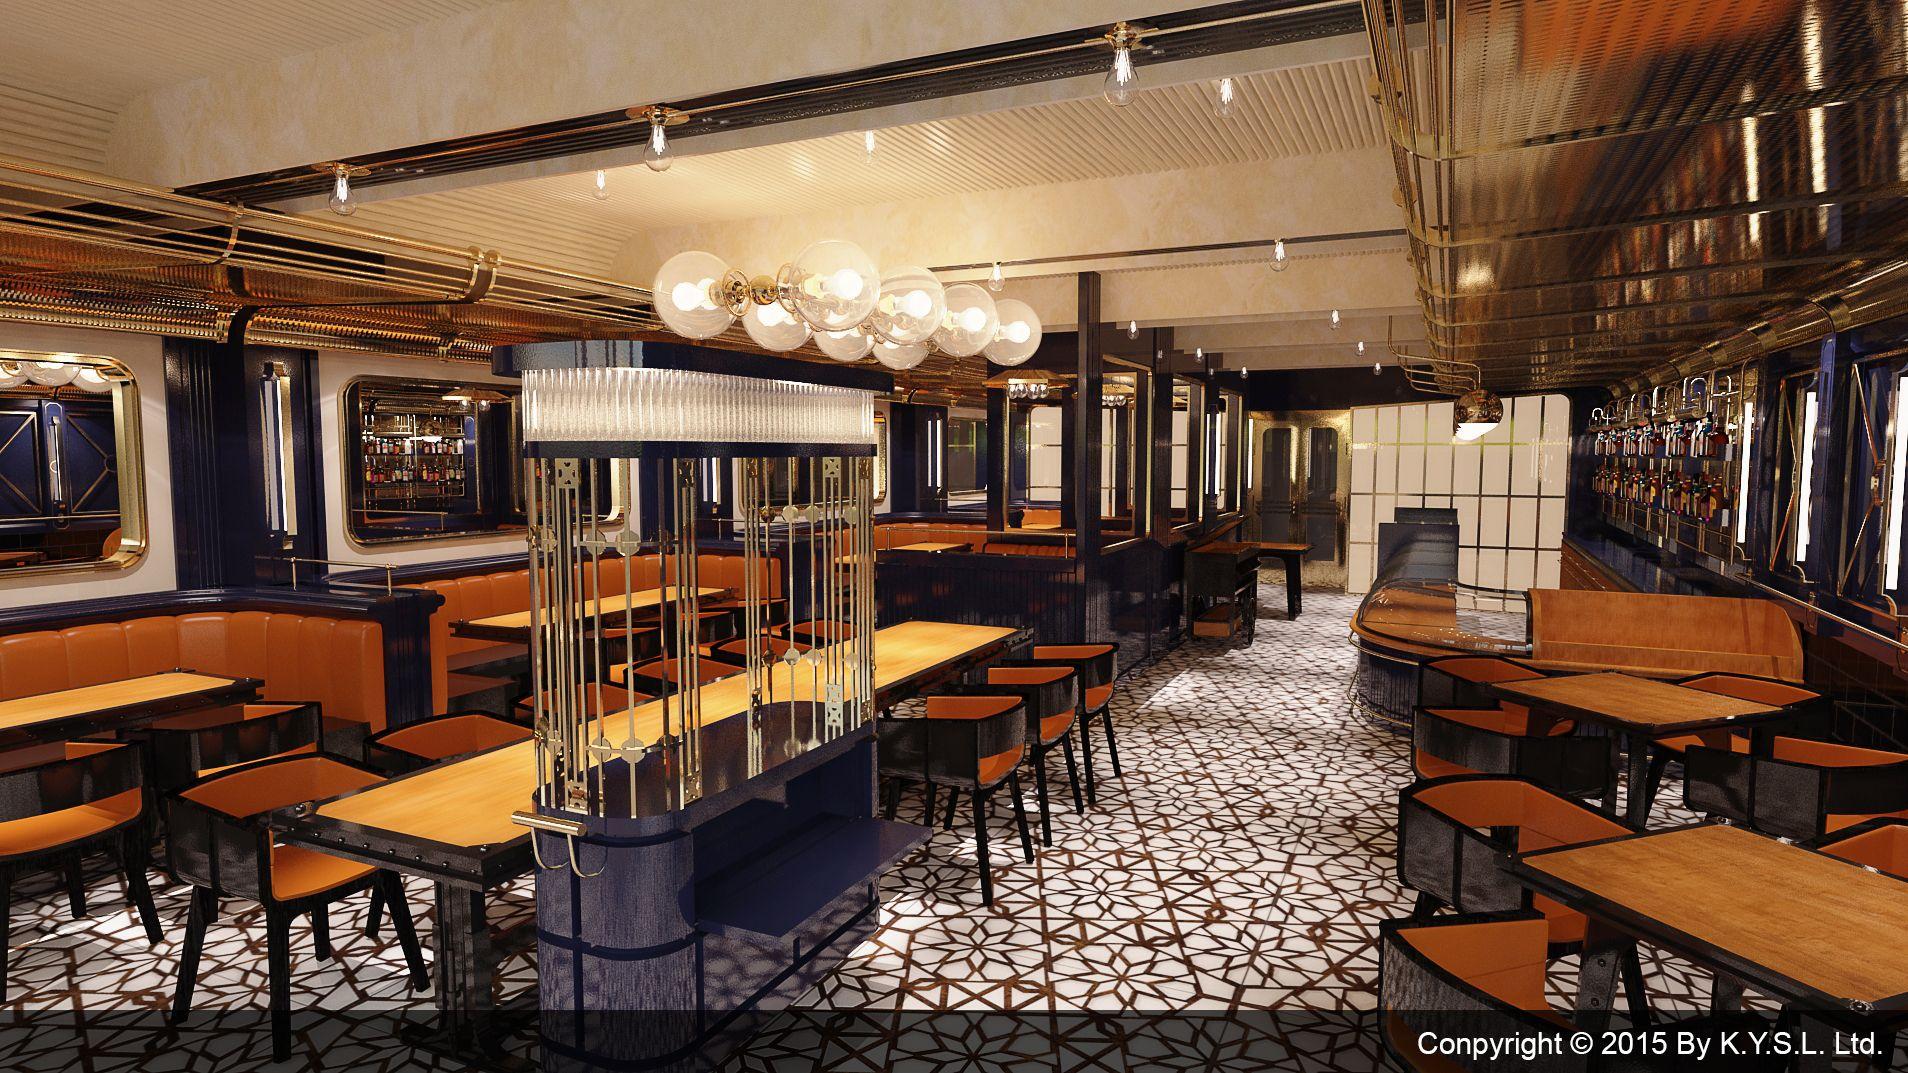 Platform 8 designed by K.Y.S.L. Ltd. An art deco restaurant & Bar ...